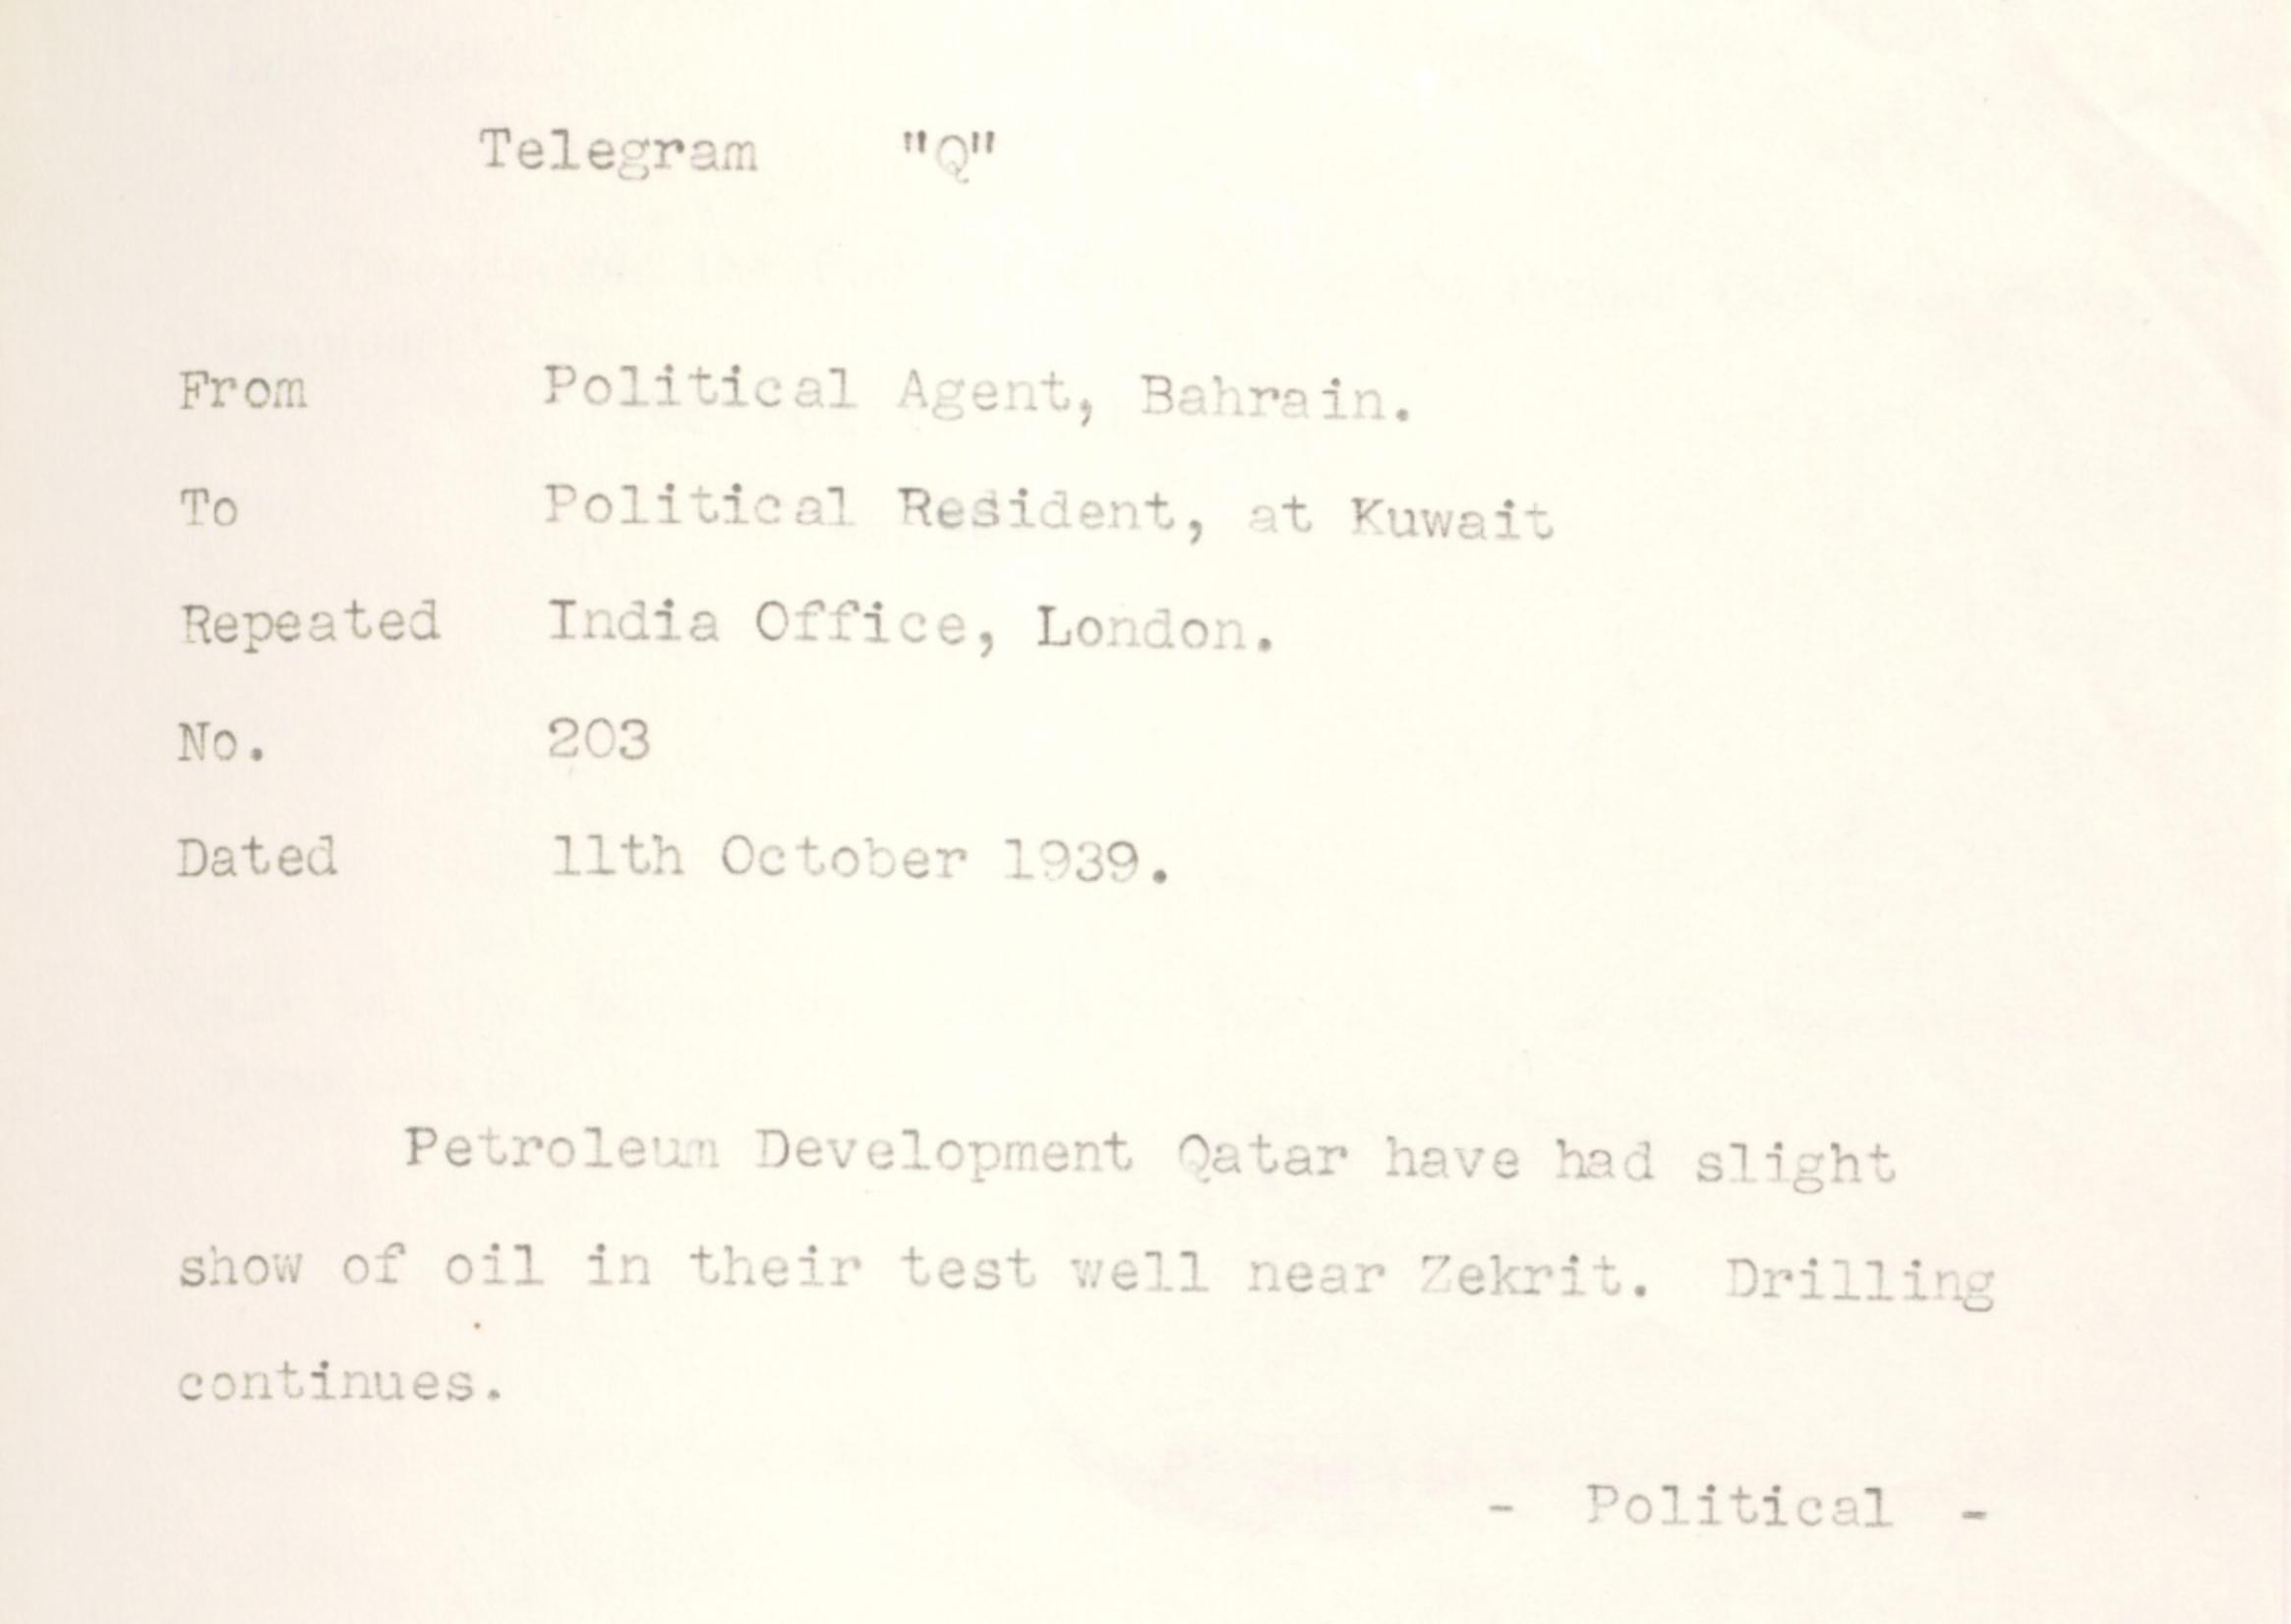 Rapport om oljefunn i Qatar, 11. oktober 1939. ( IOR/R/15/2/418 )